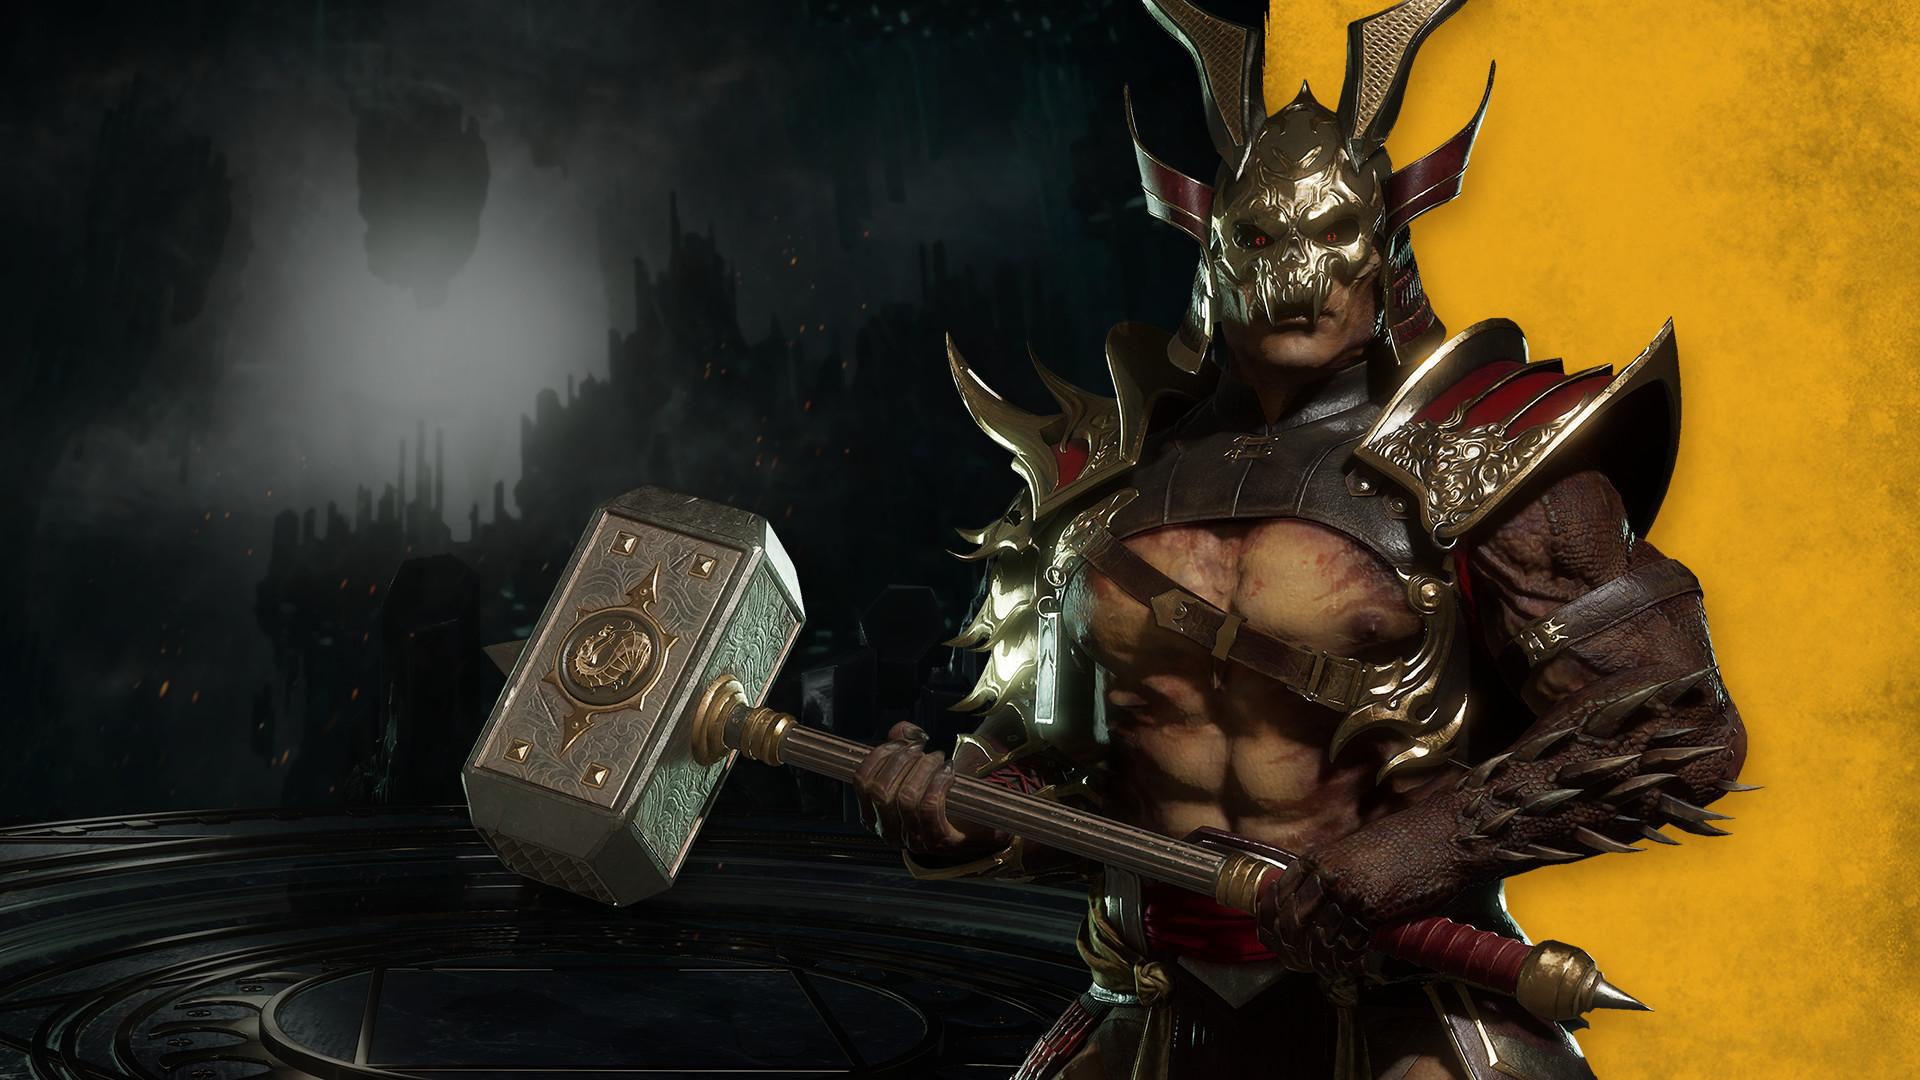 Mortal Kombat 11 Shao Kahn (PC) Klíč Steam (PC)